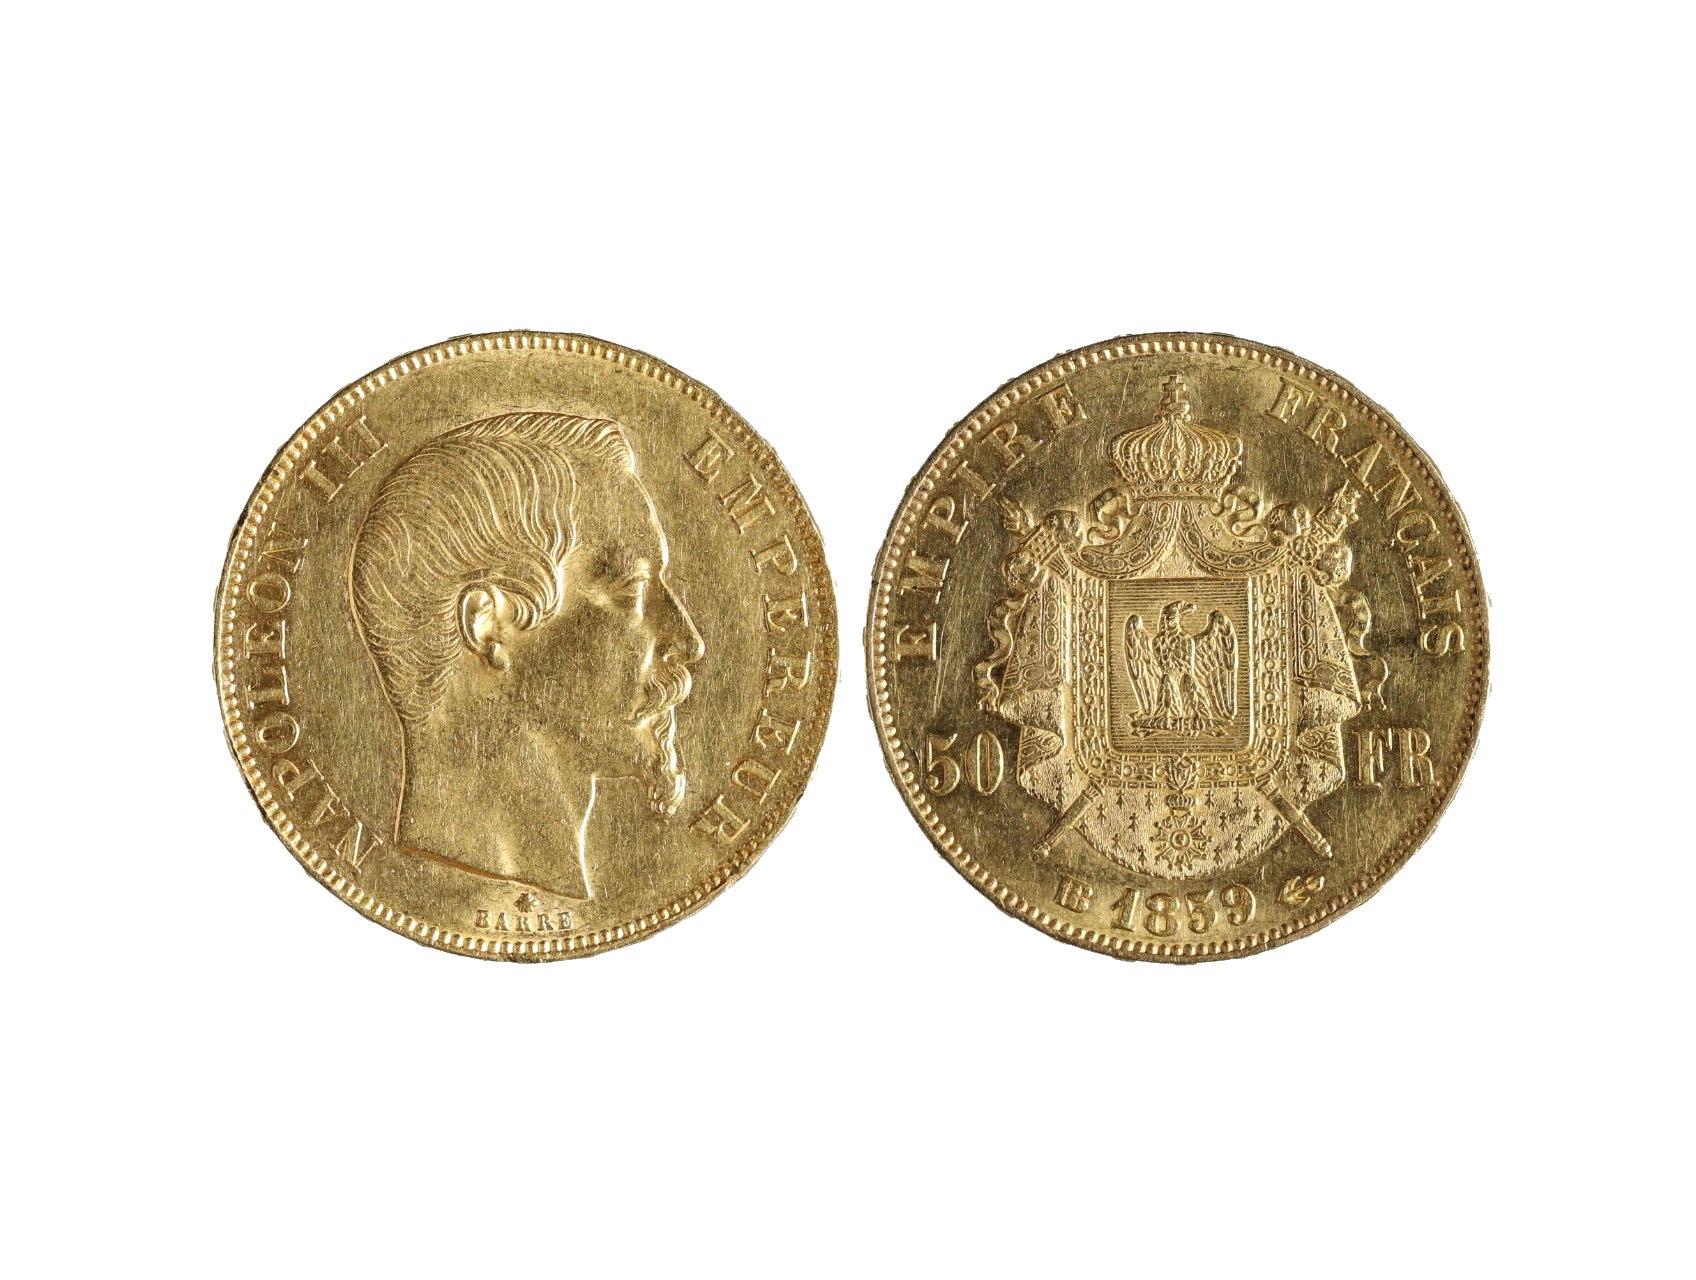 Francie, Napoleon III. - 50 Frank 1959 A, 16,129 g, Au 0,900